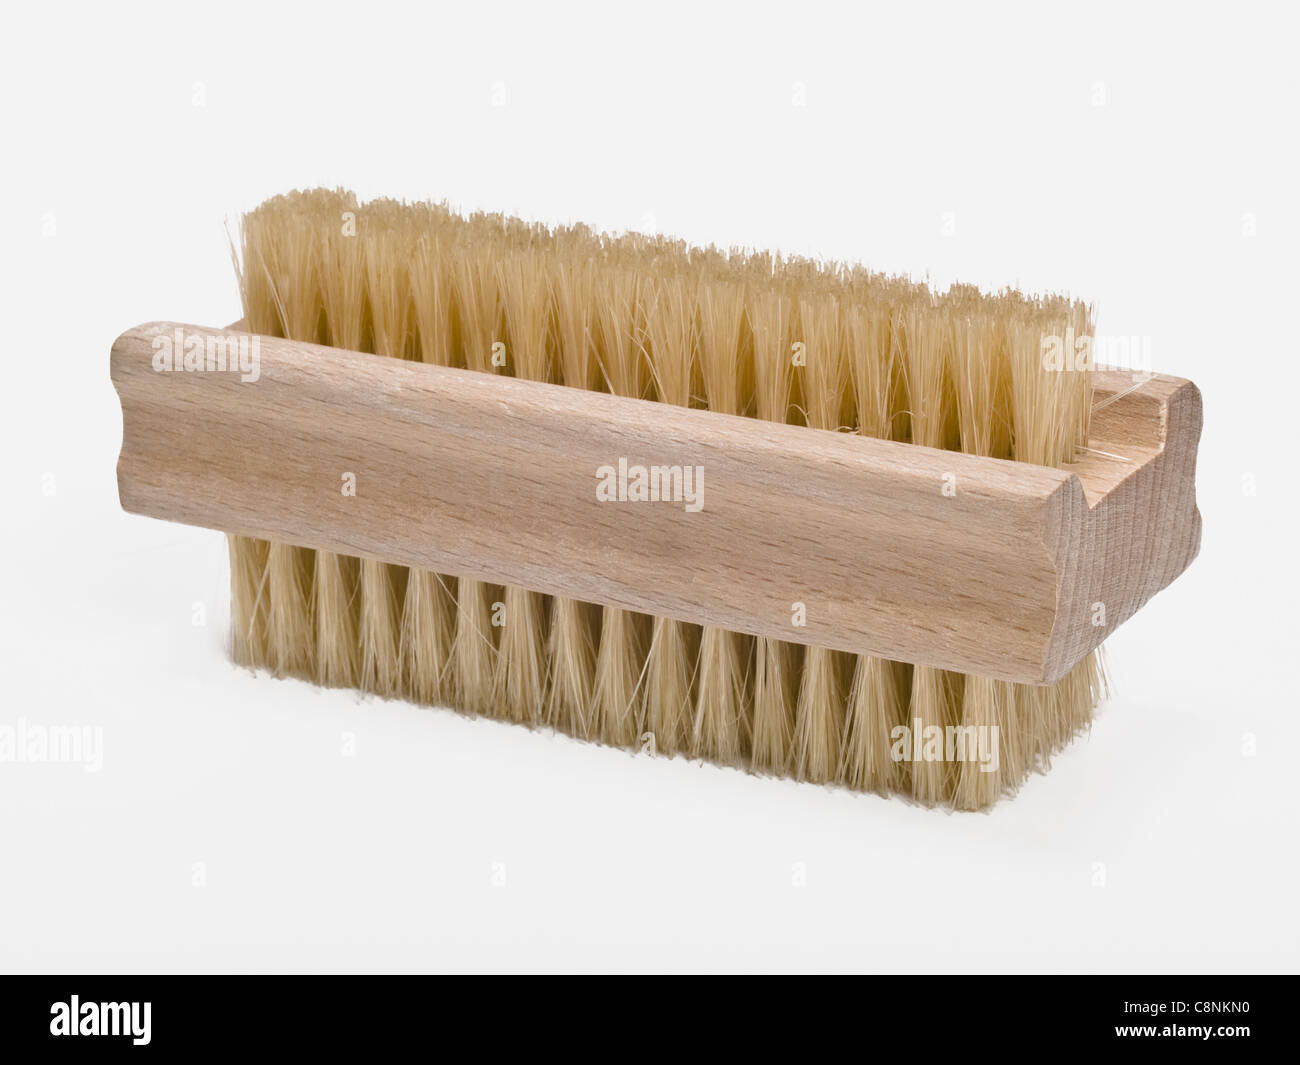 Nailbrush Stockfotos & Nailbrush Bilder - Alamy